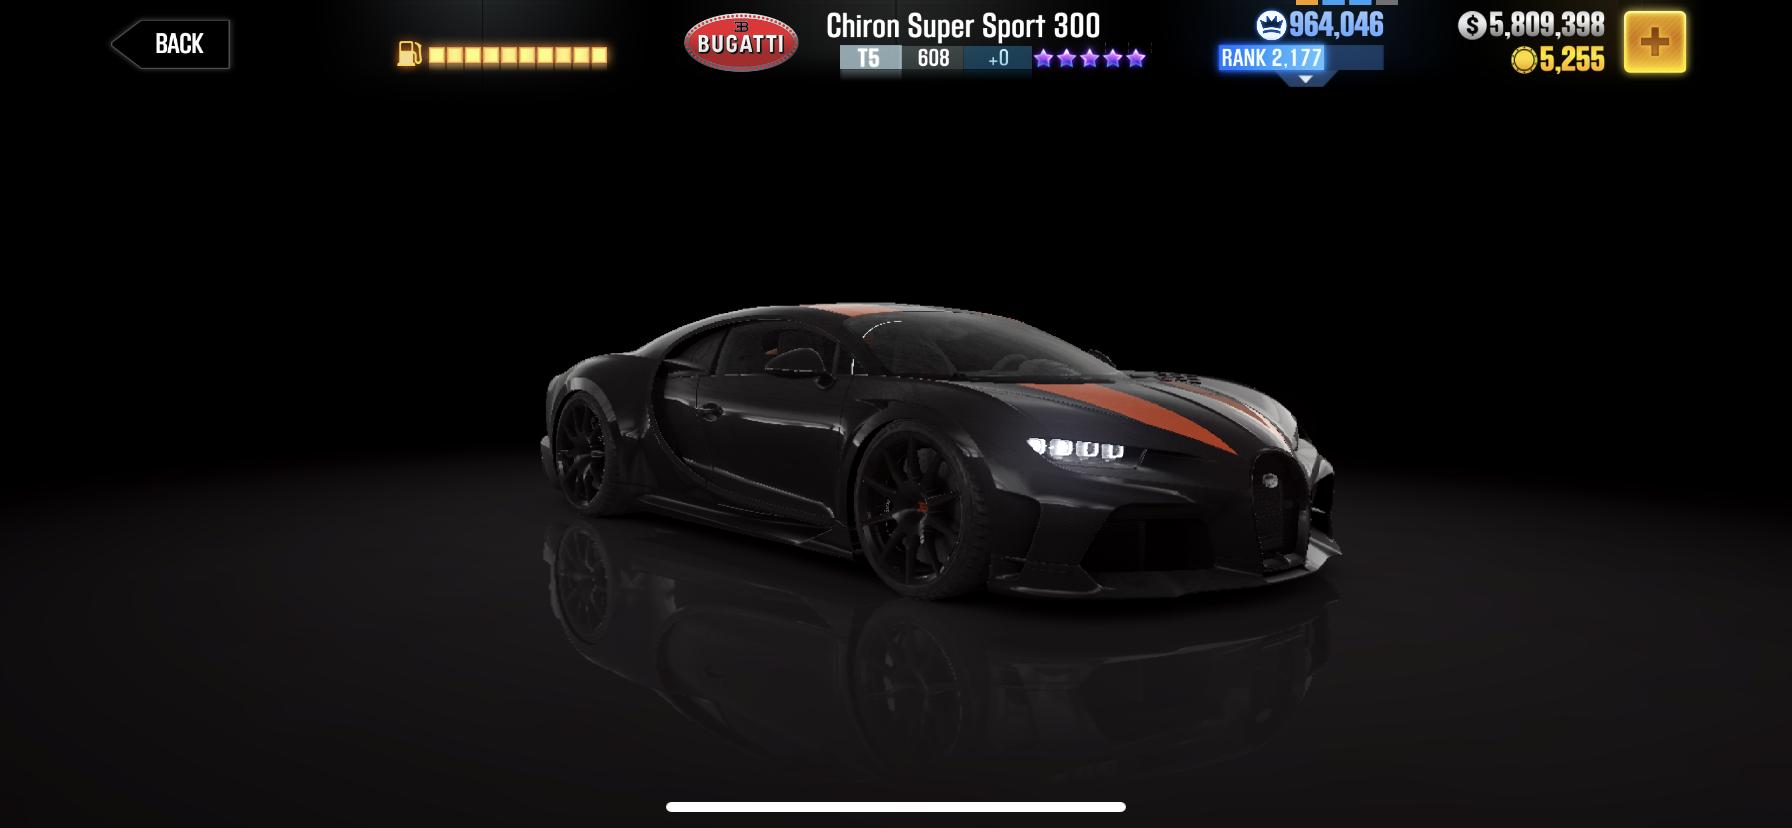 Bugatti Chiron Super Sport 300 Csr Racing Wiki Fandom